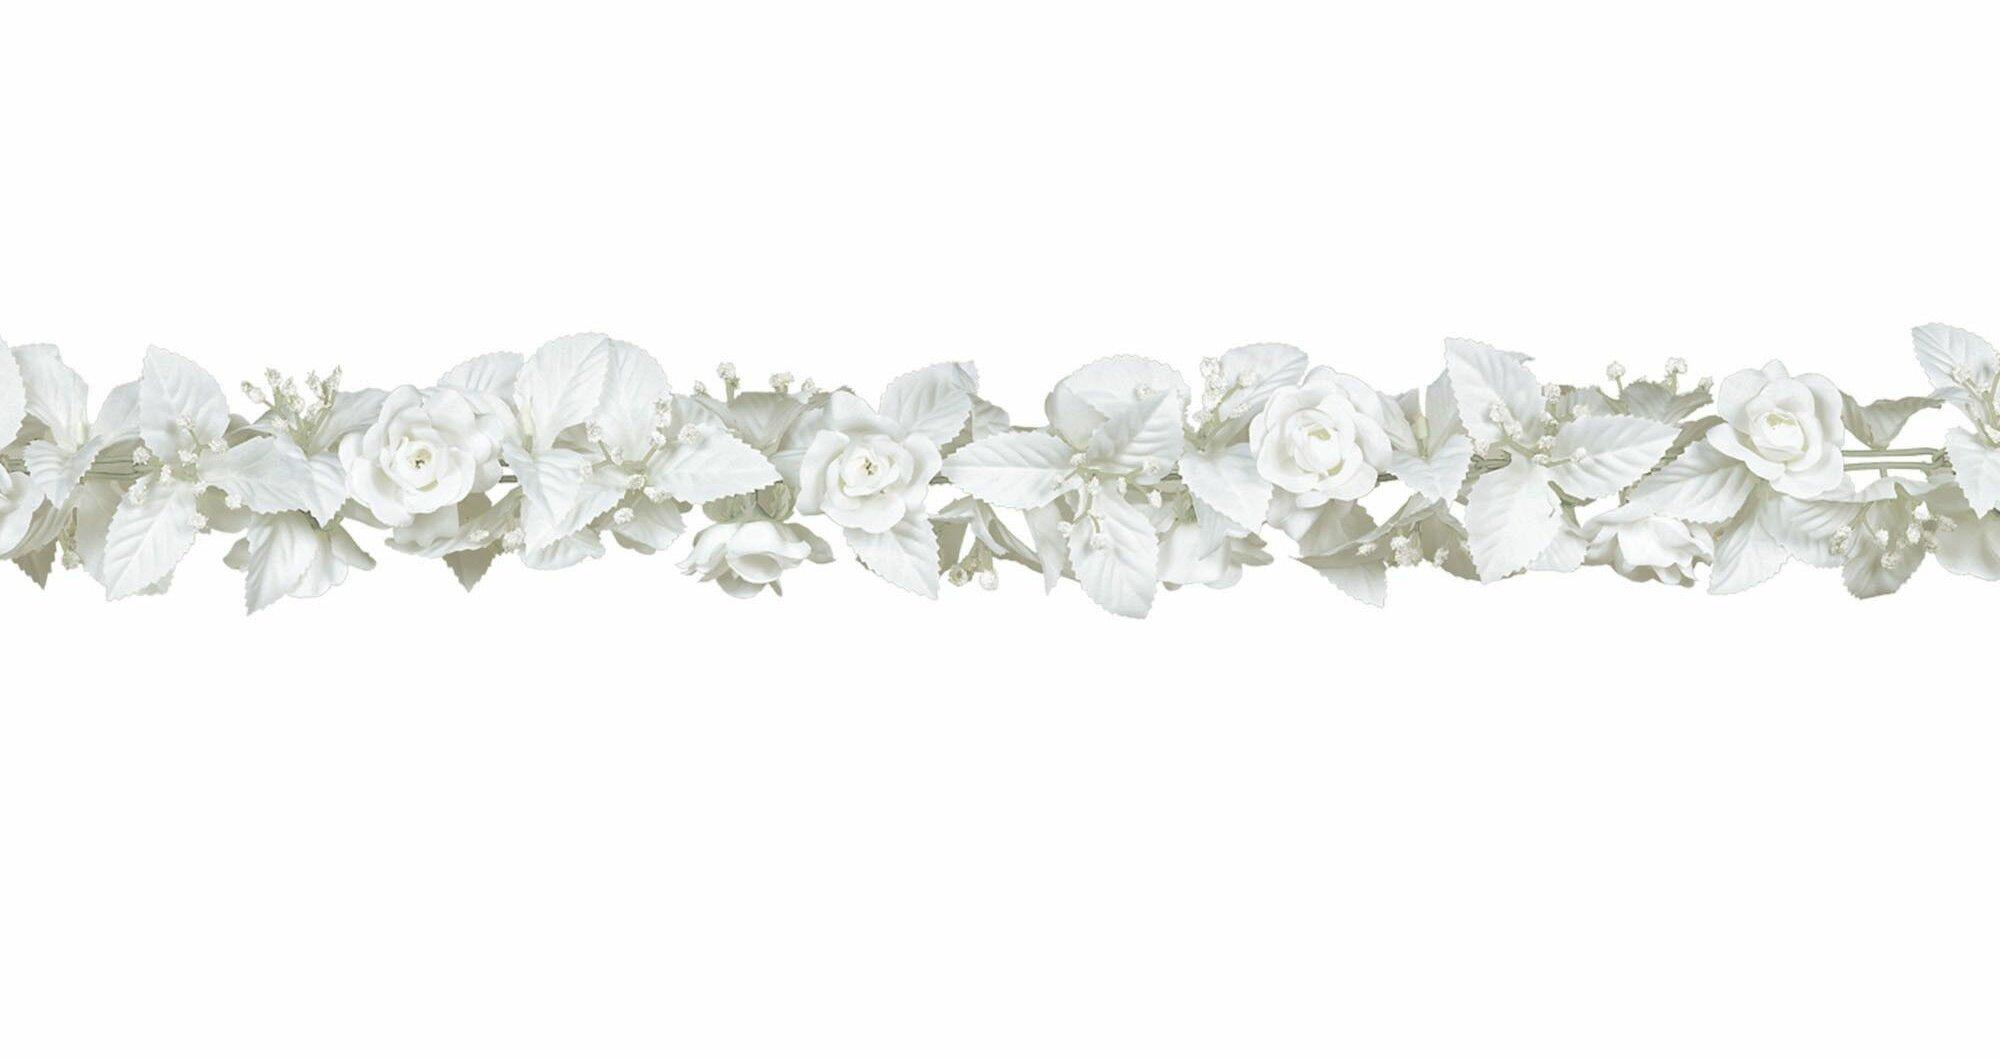 Amscan 225702 Wedding Garland One Size White